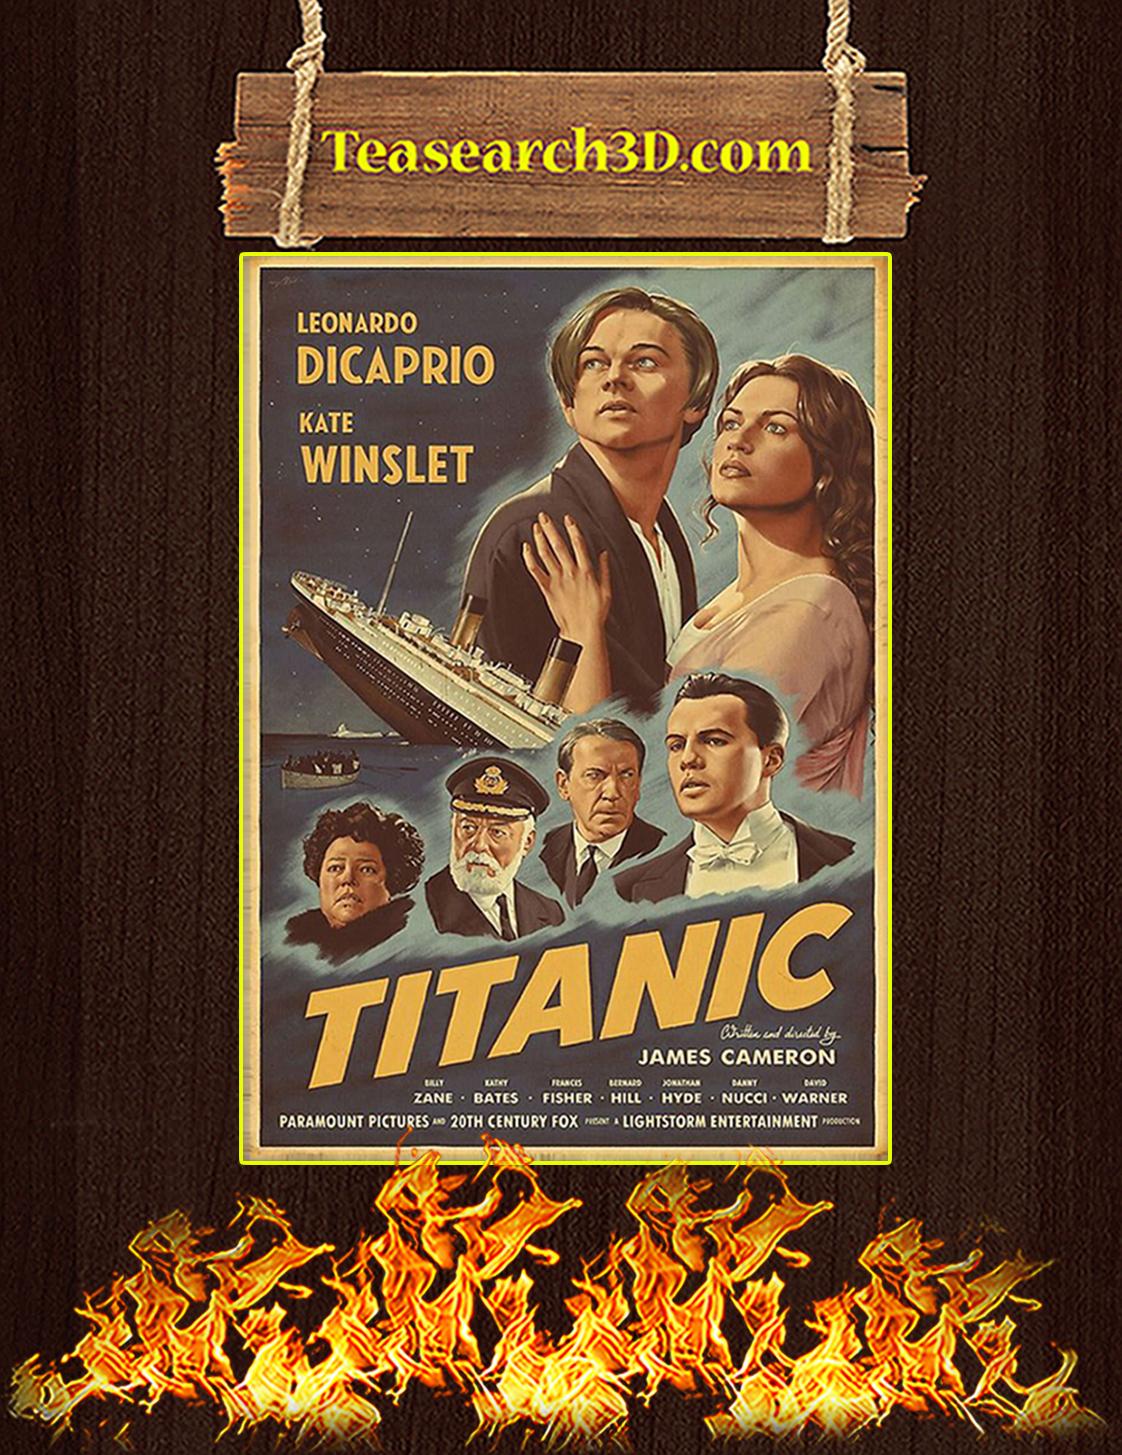 Titanic Leonardo Dicaprio Kate Winslet Poster A3